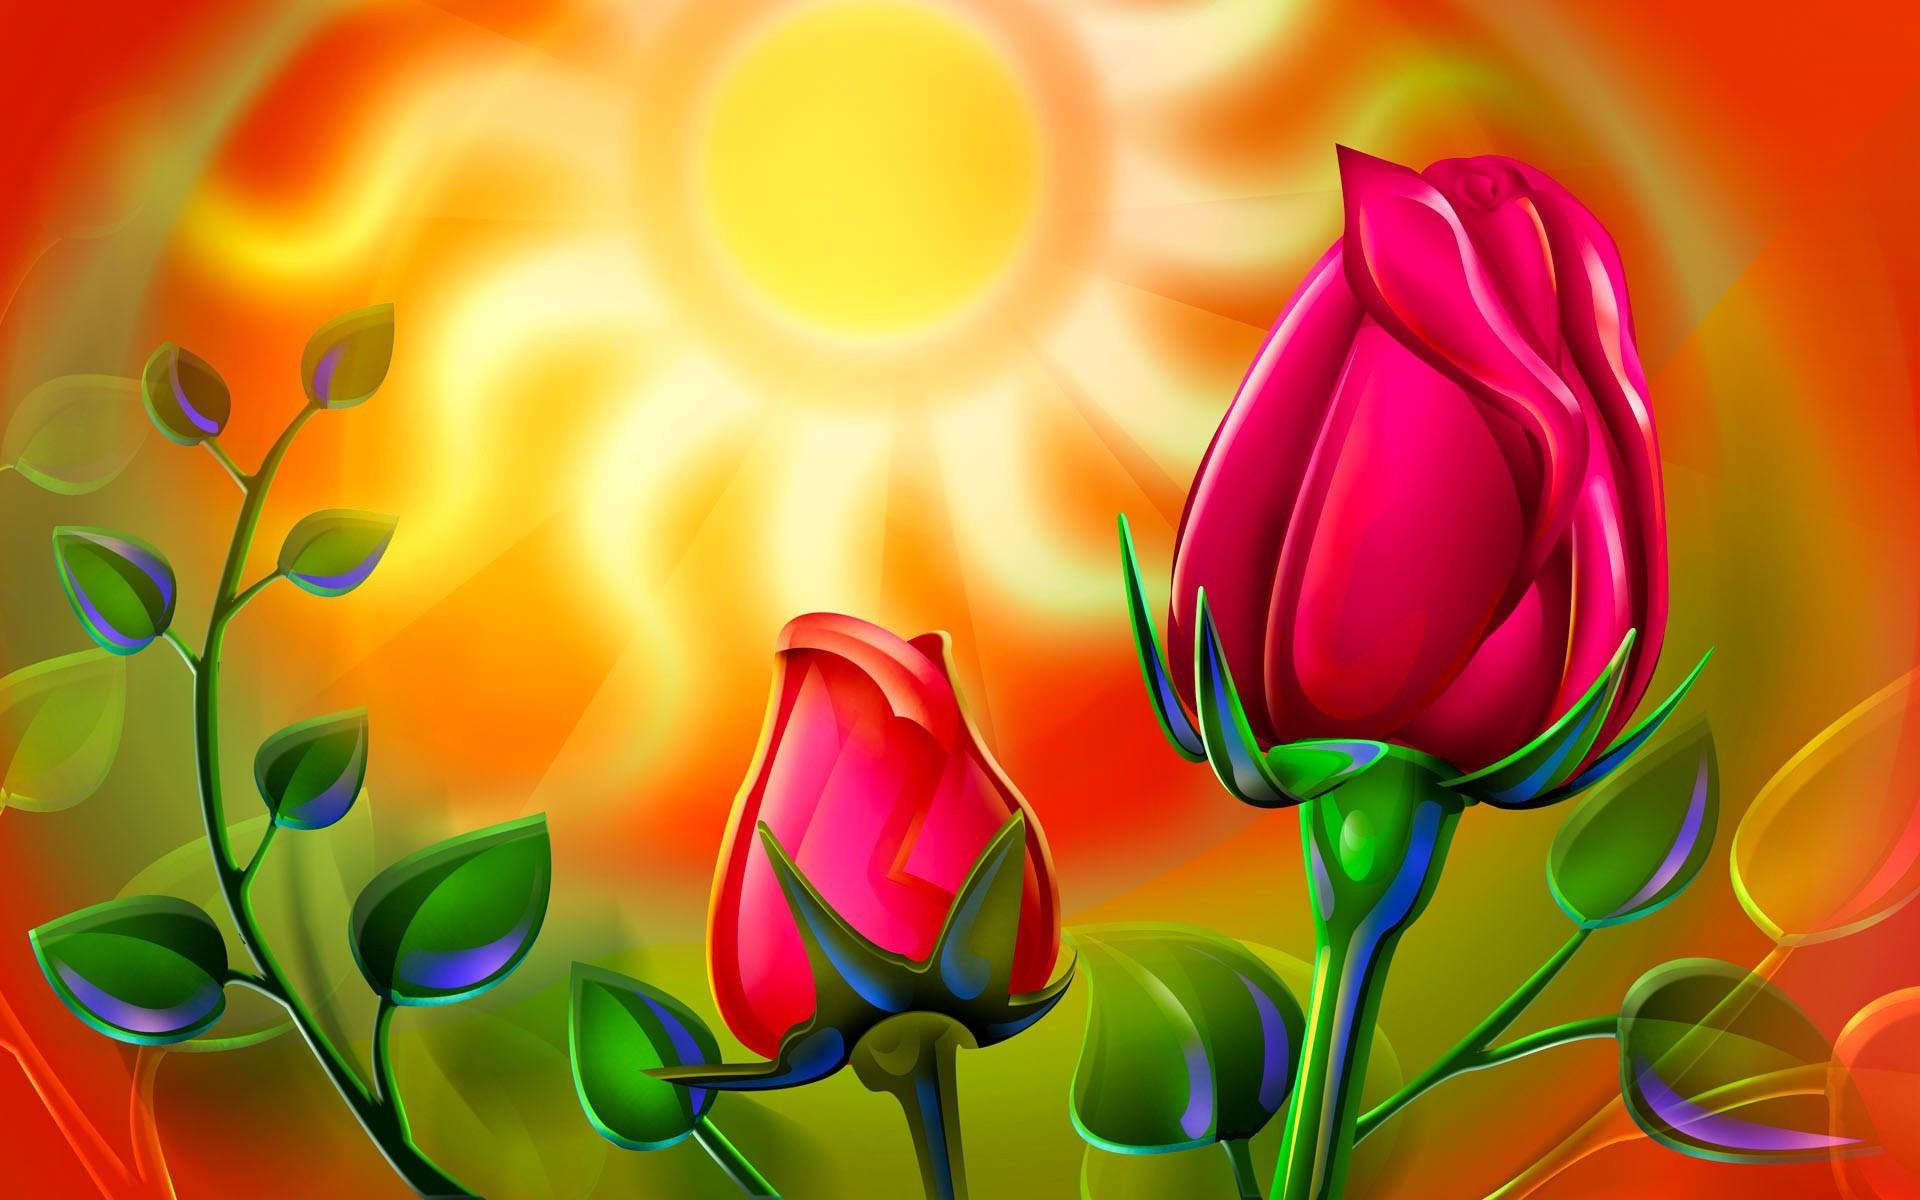 Most Beautiful Flower Image Hd Flowers Healthy